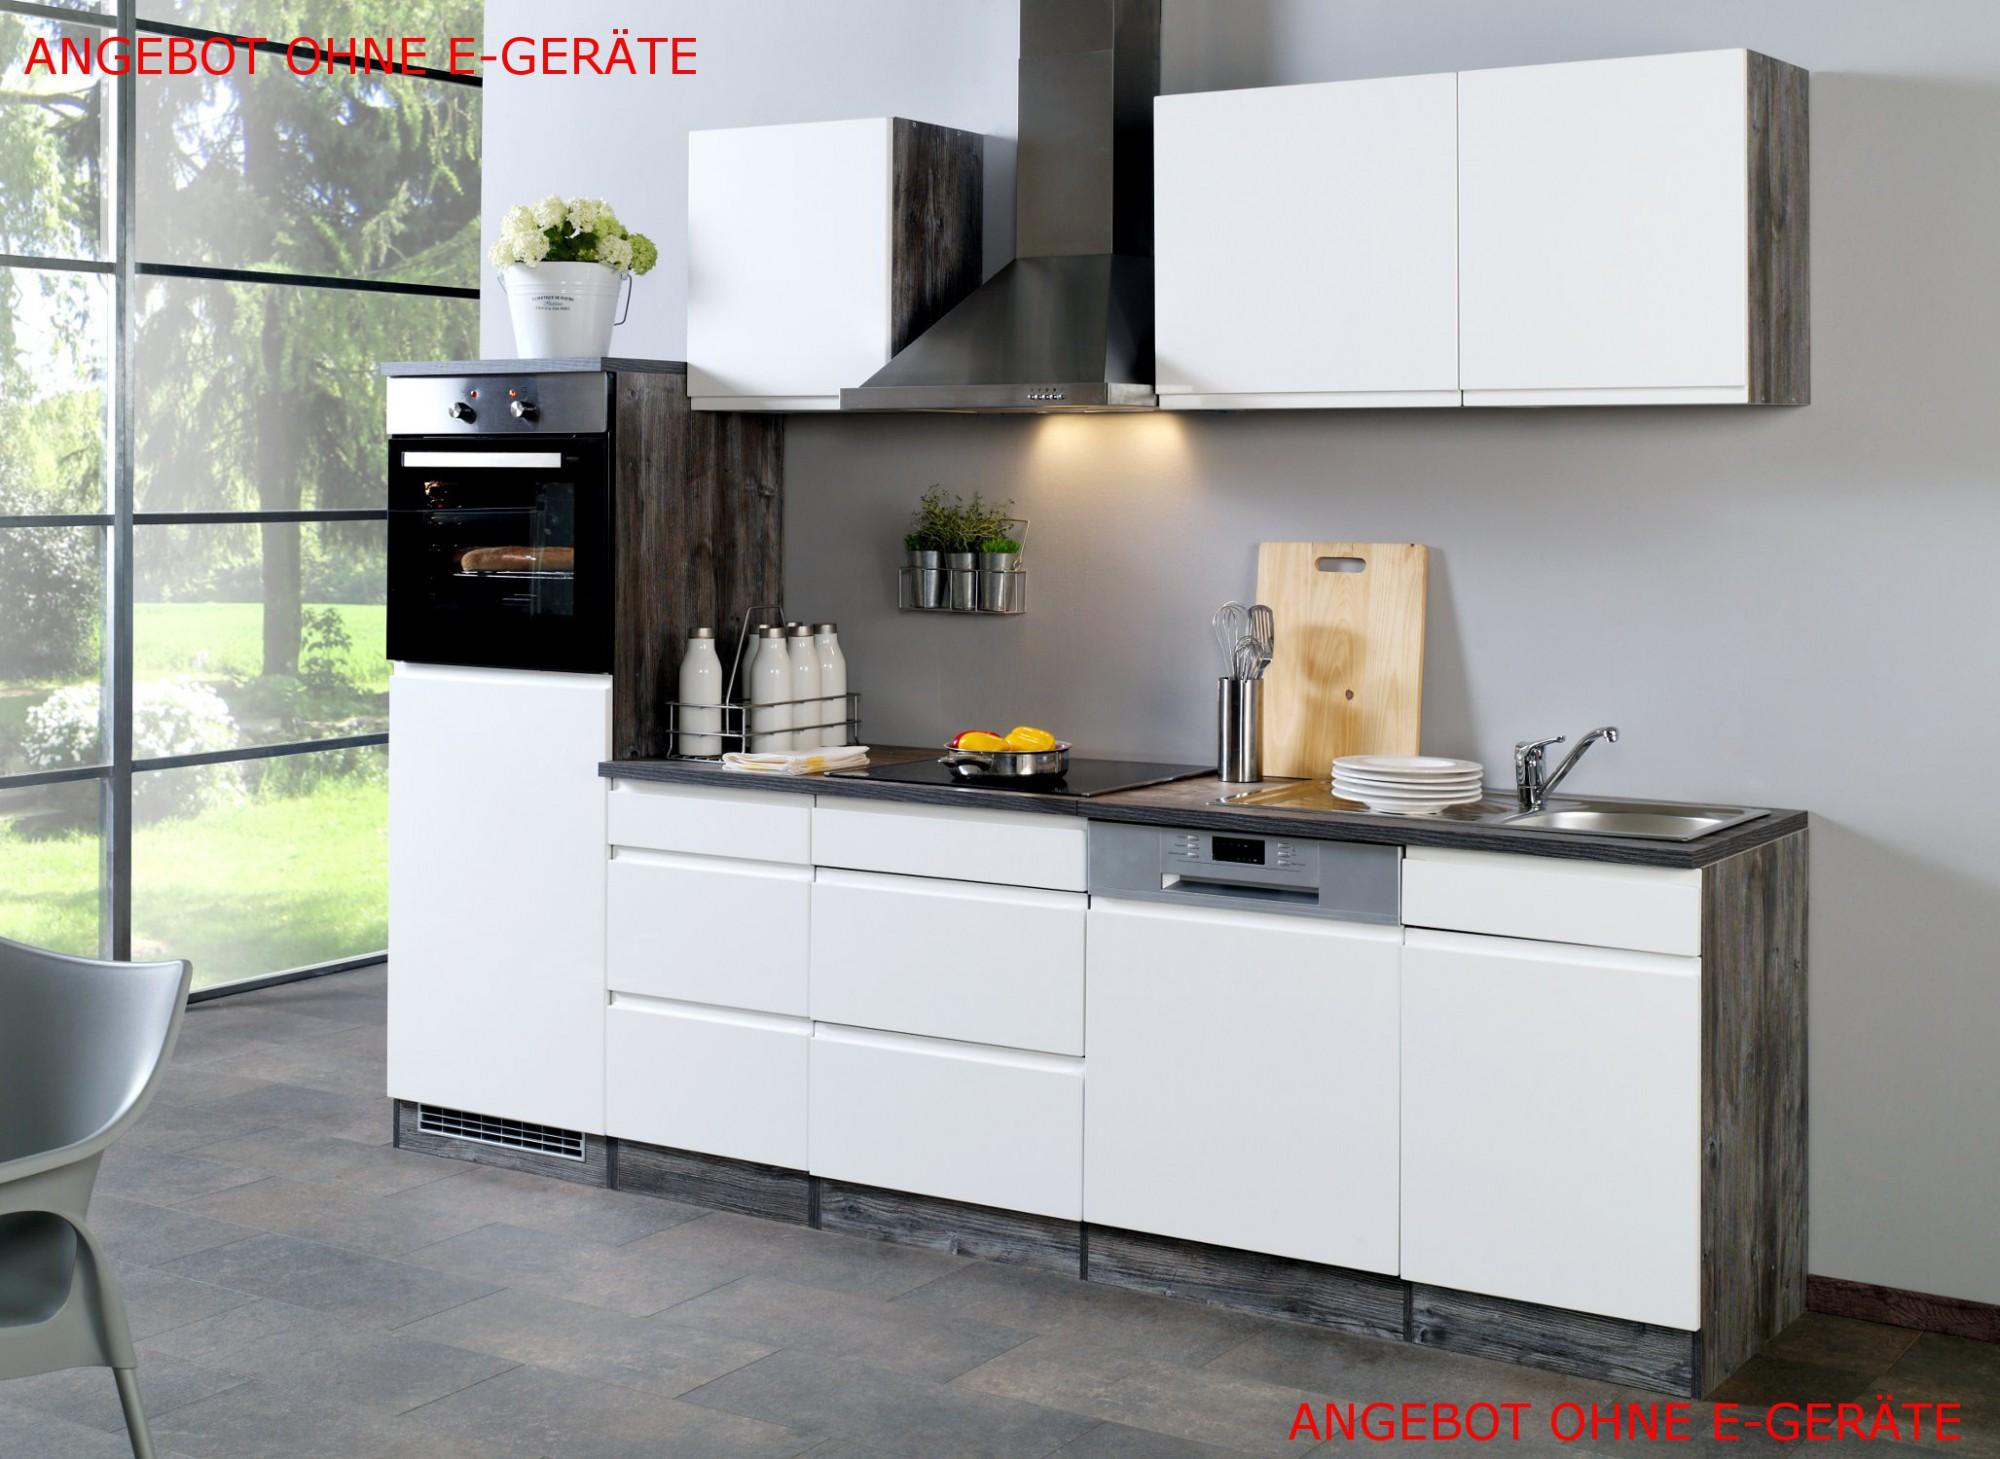 neu k chen leerblock k chenzeile cardiff k chenblock. Black Bedroom Furniture Sets. Home Design Ideas